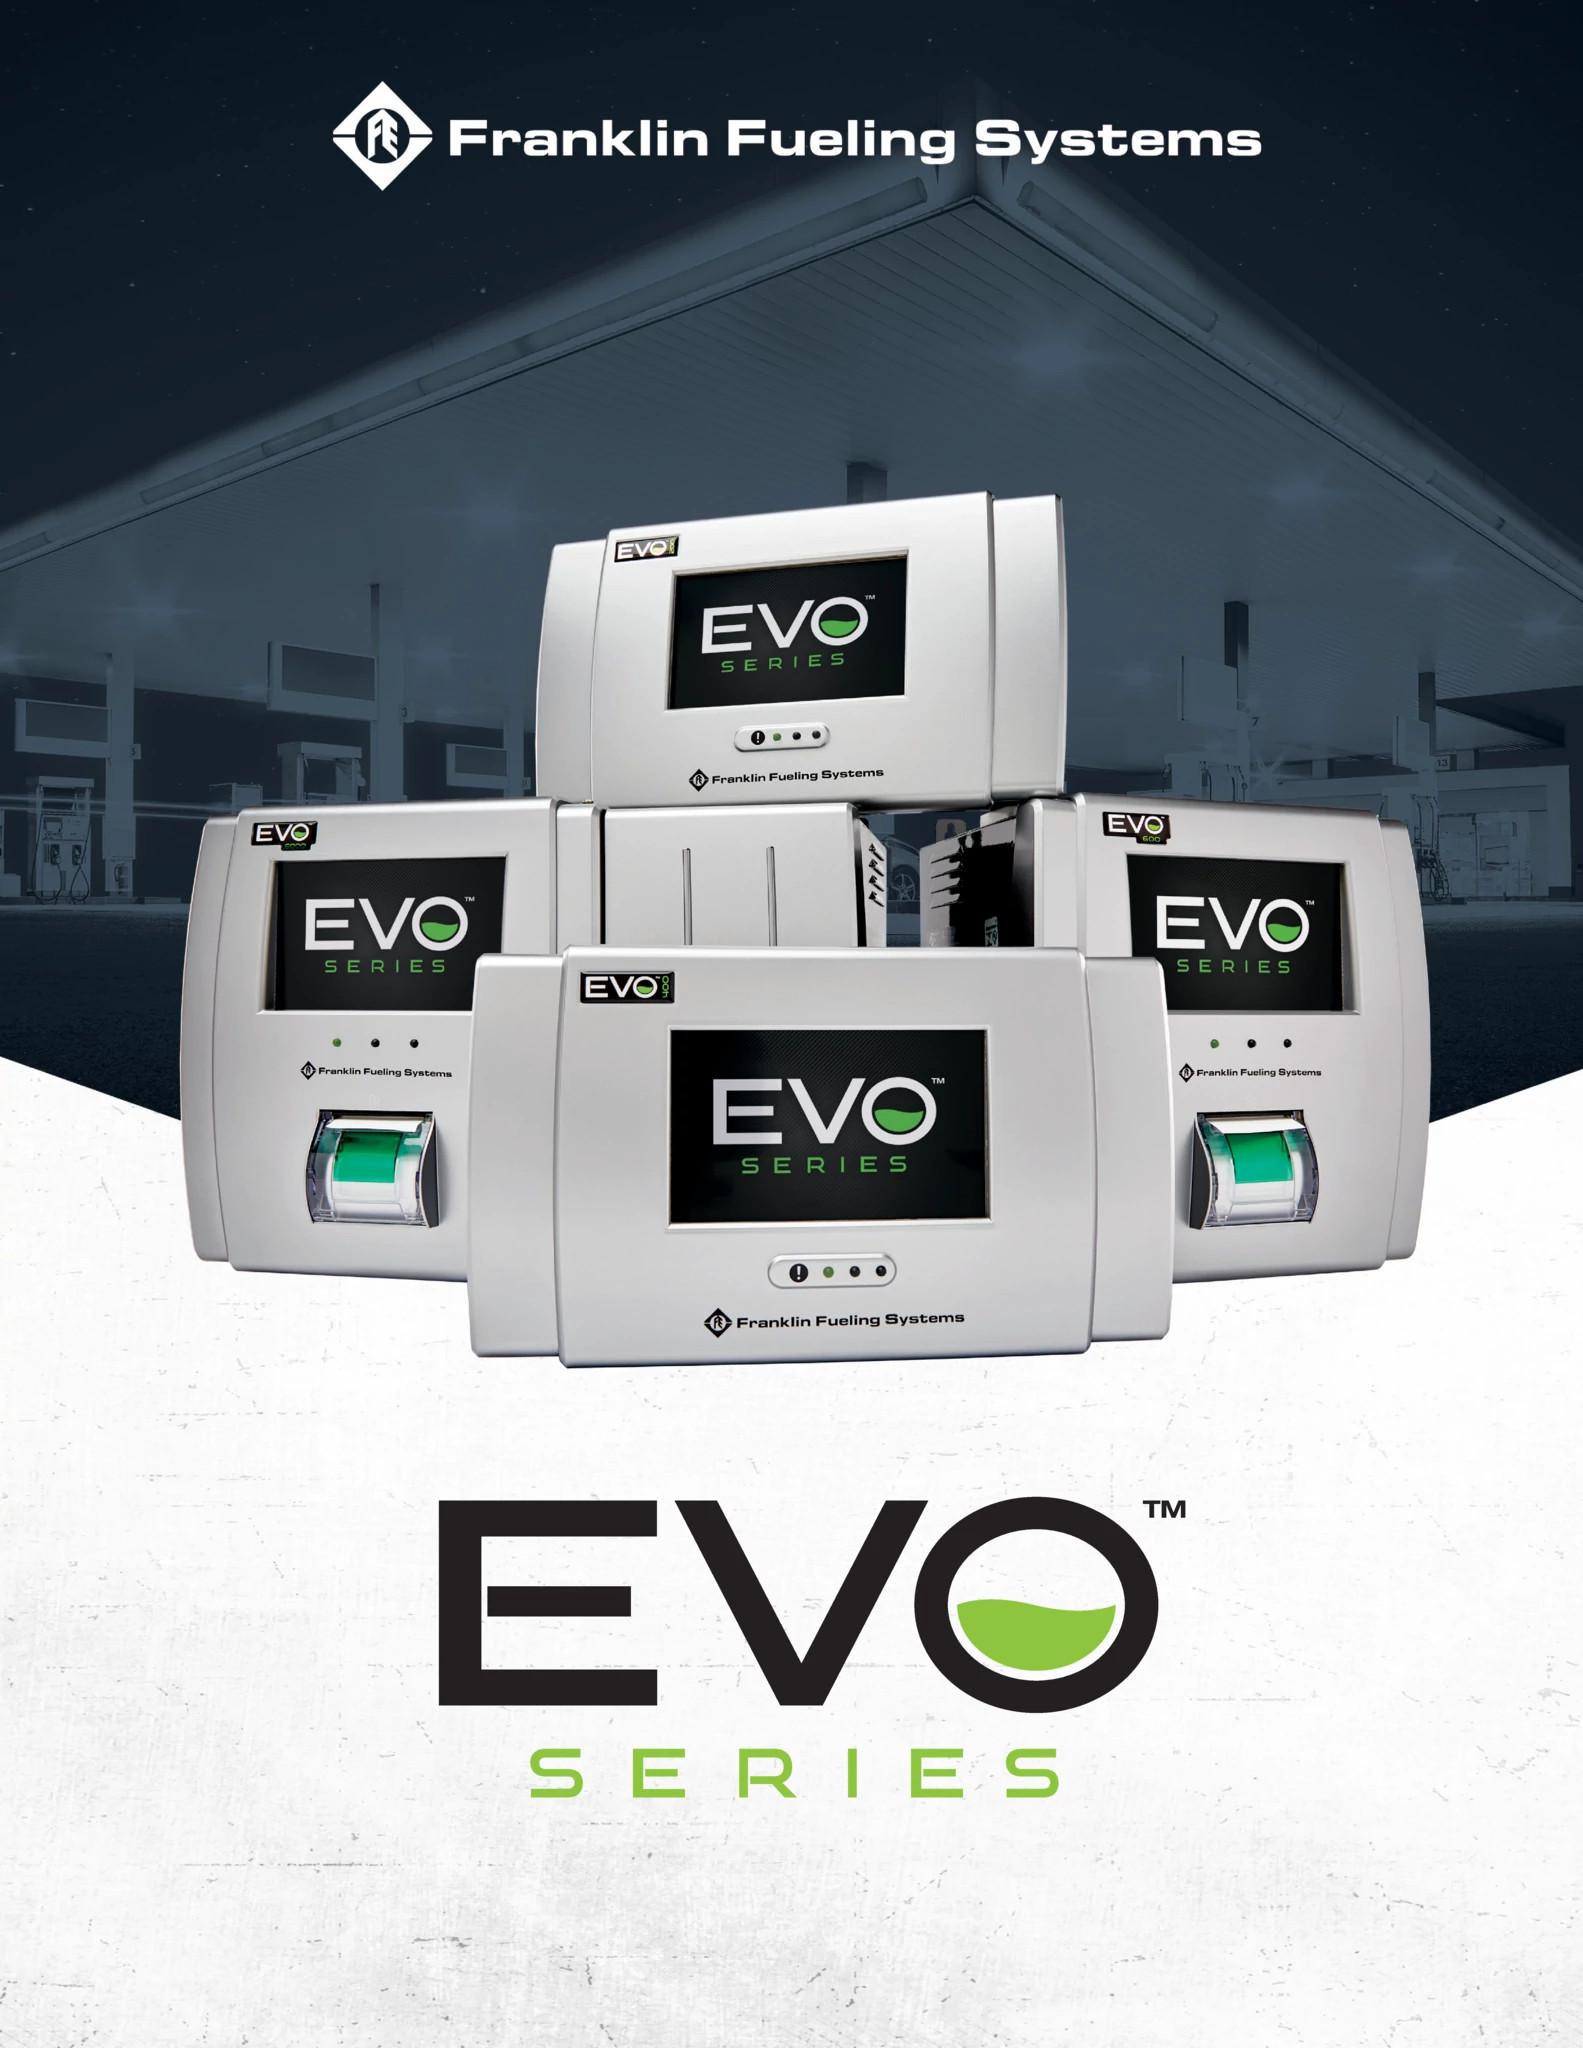 FFS-0792 EVO Series Brochure